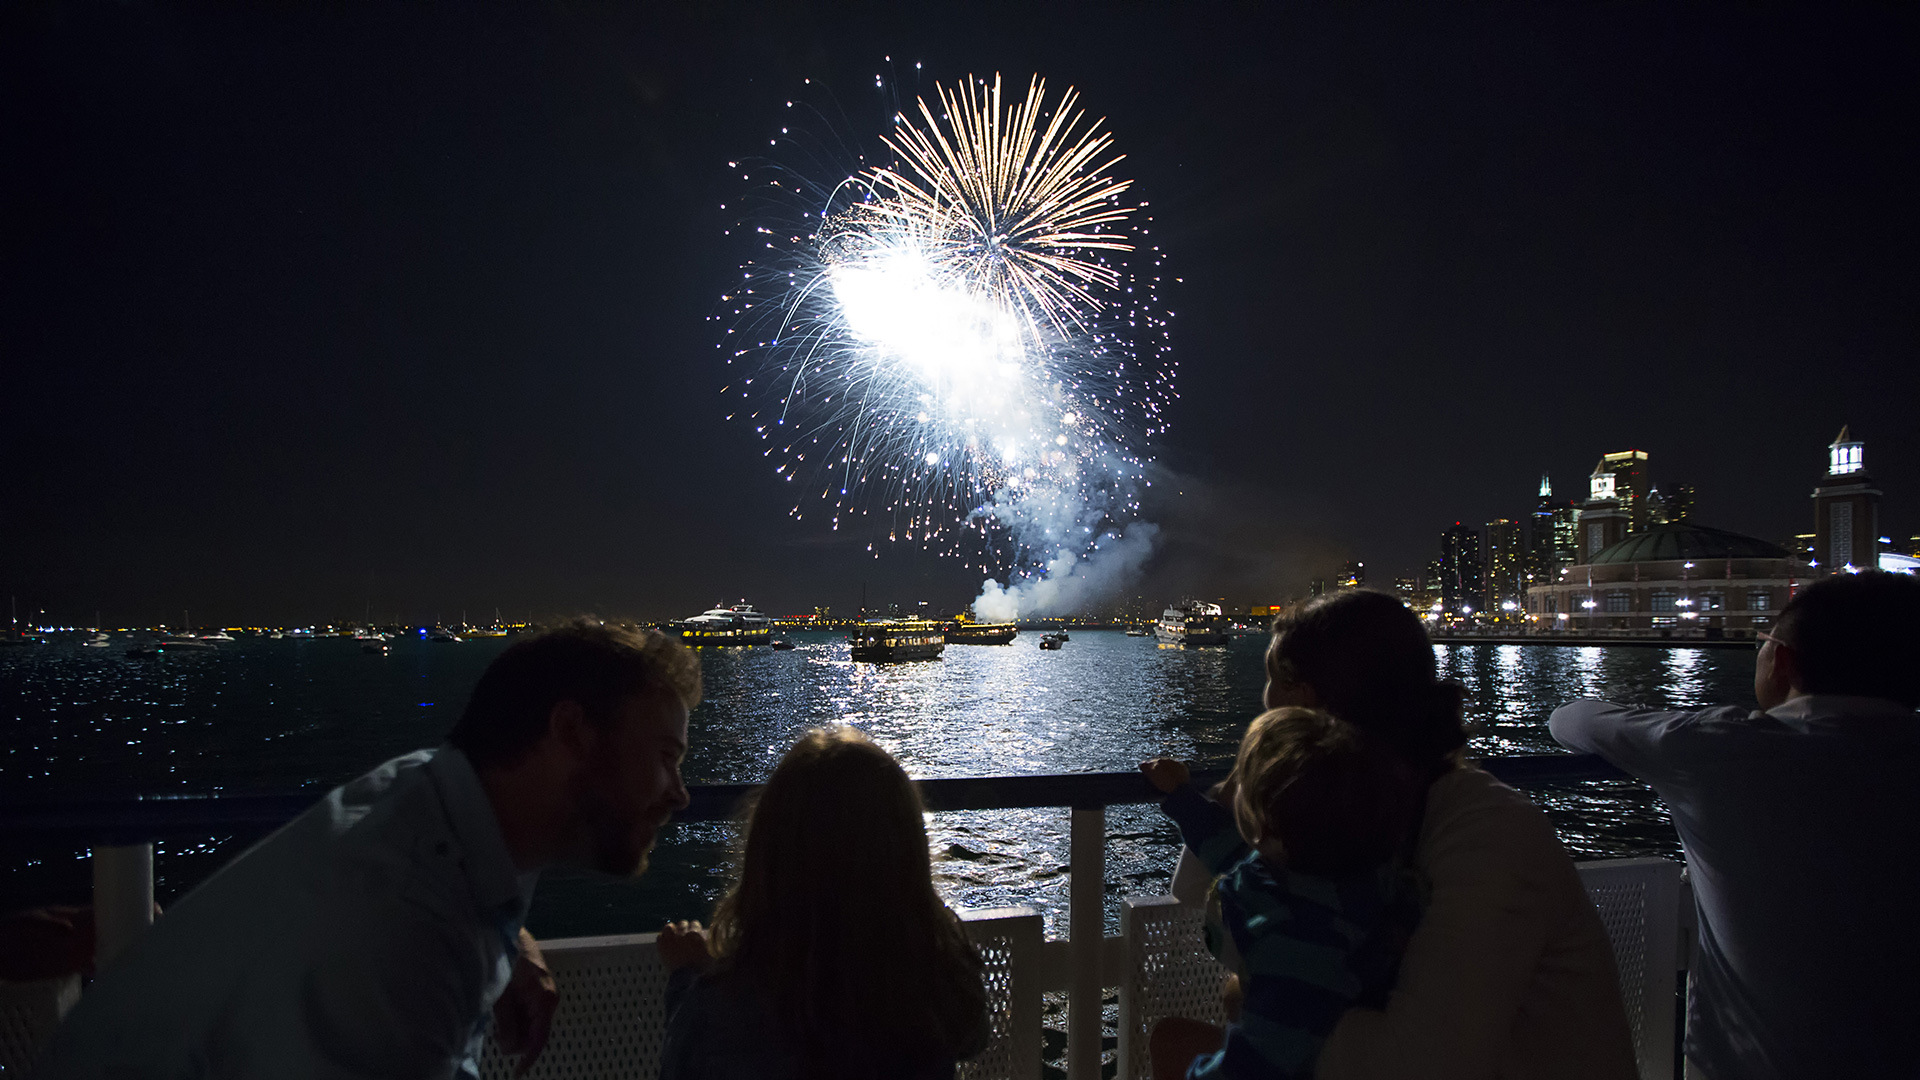 Shoreline Sightseeing Fireworks Tours